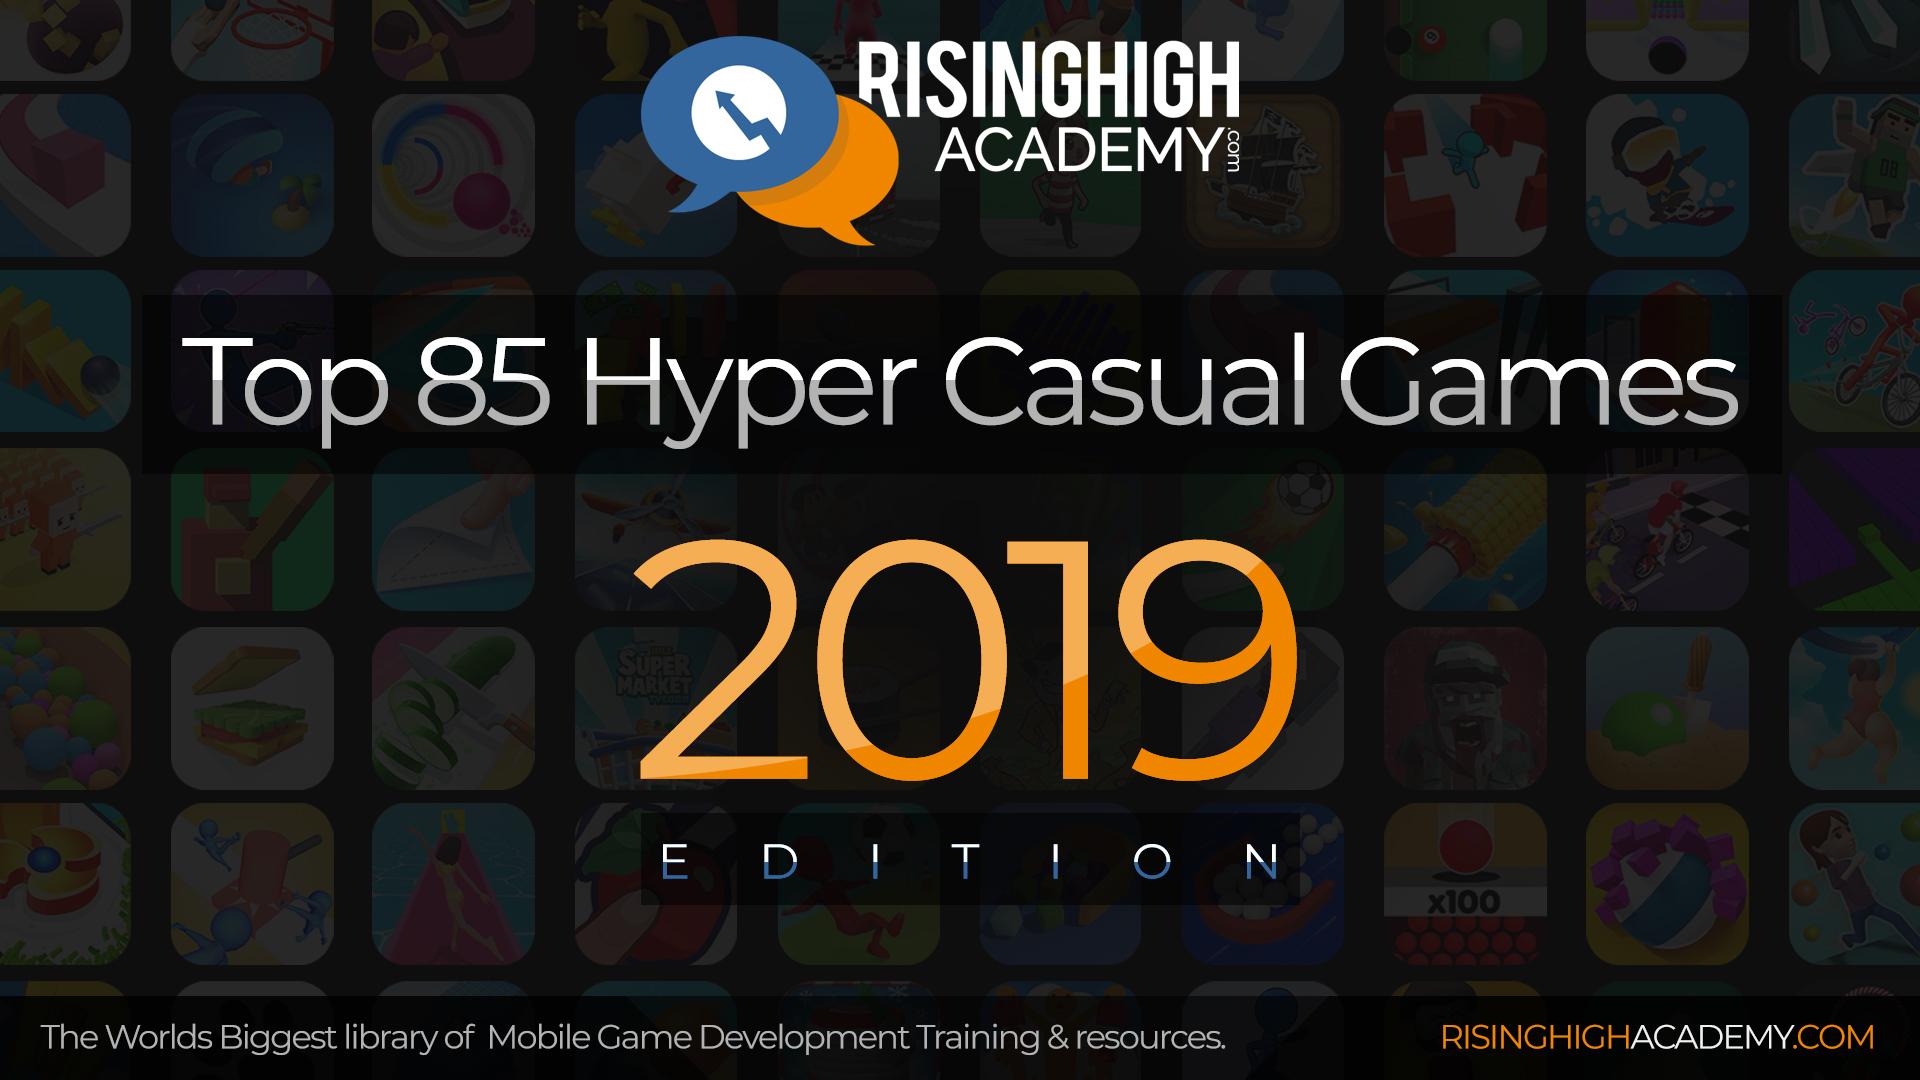 Top 85 Hyper Casual Games